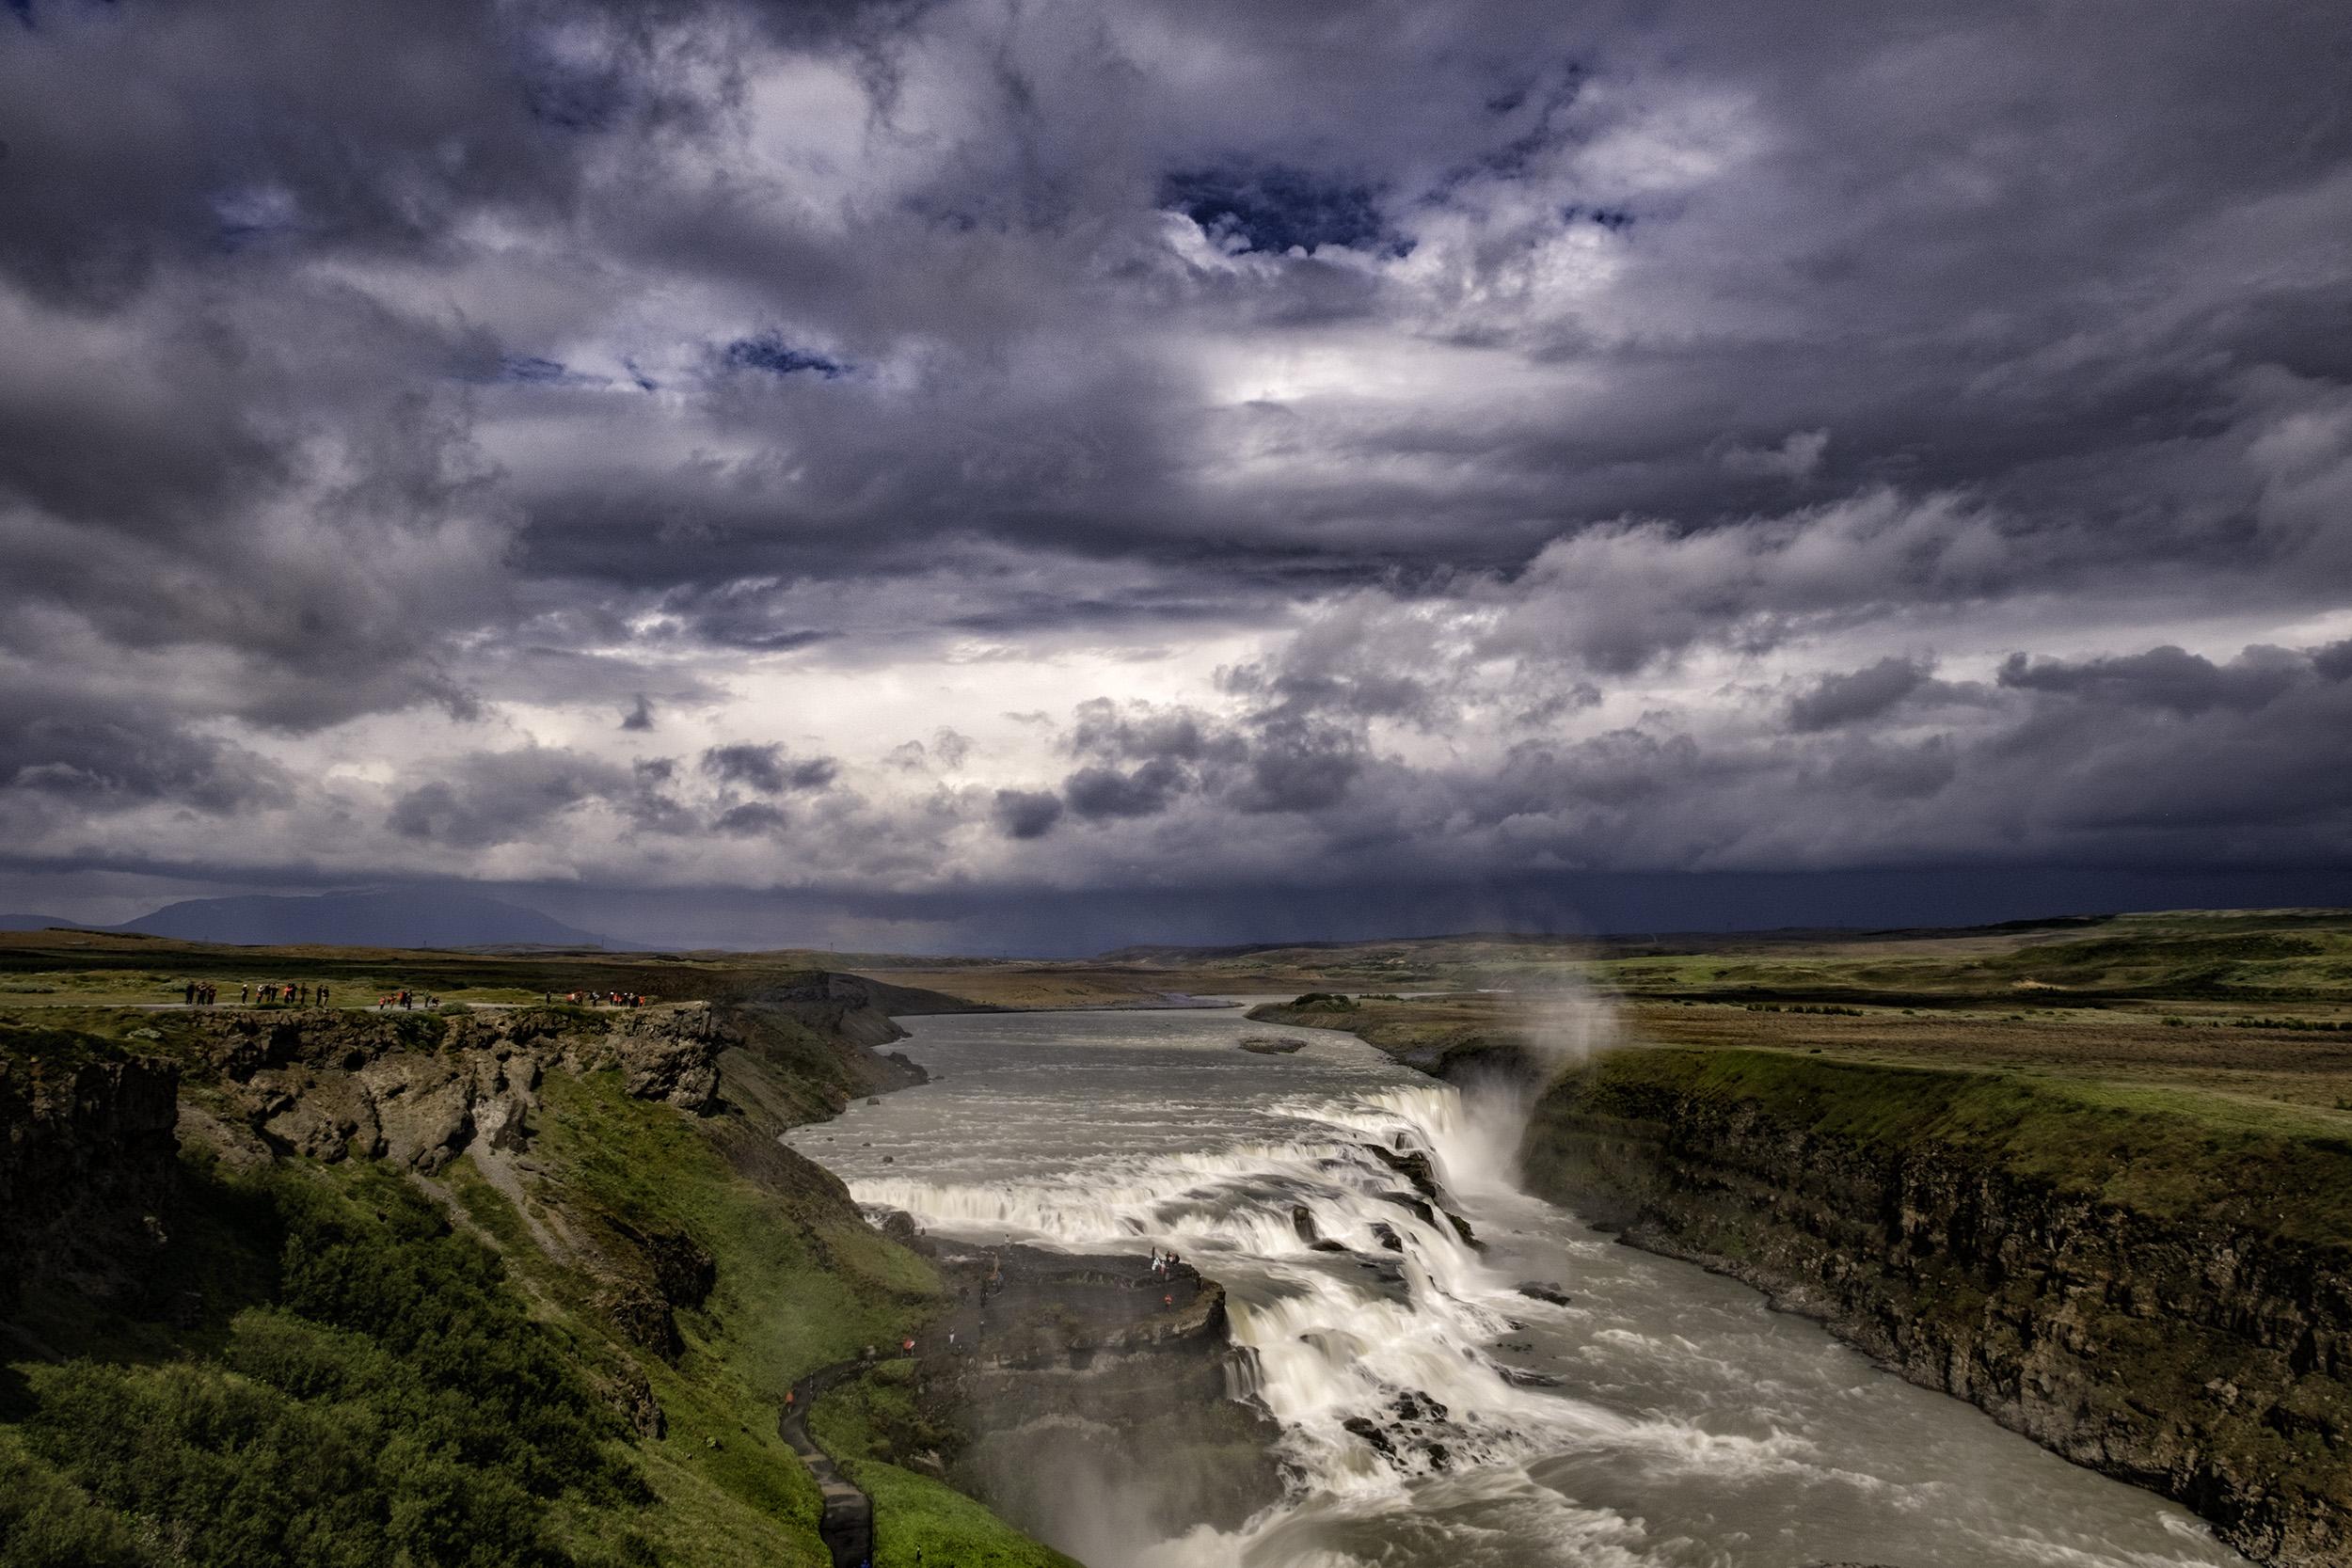 Storm over Gullfoss, Iceland